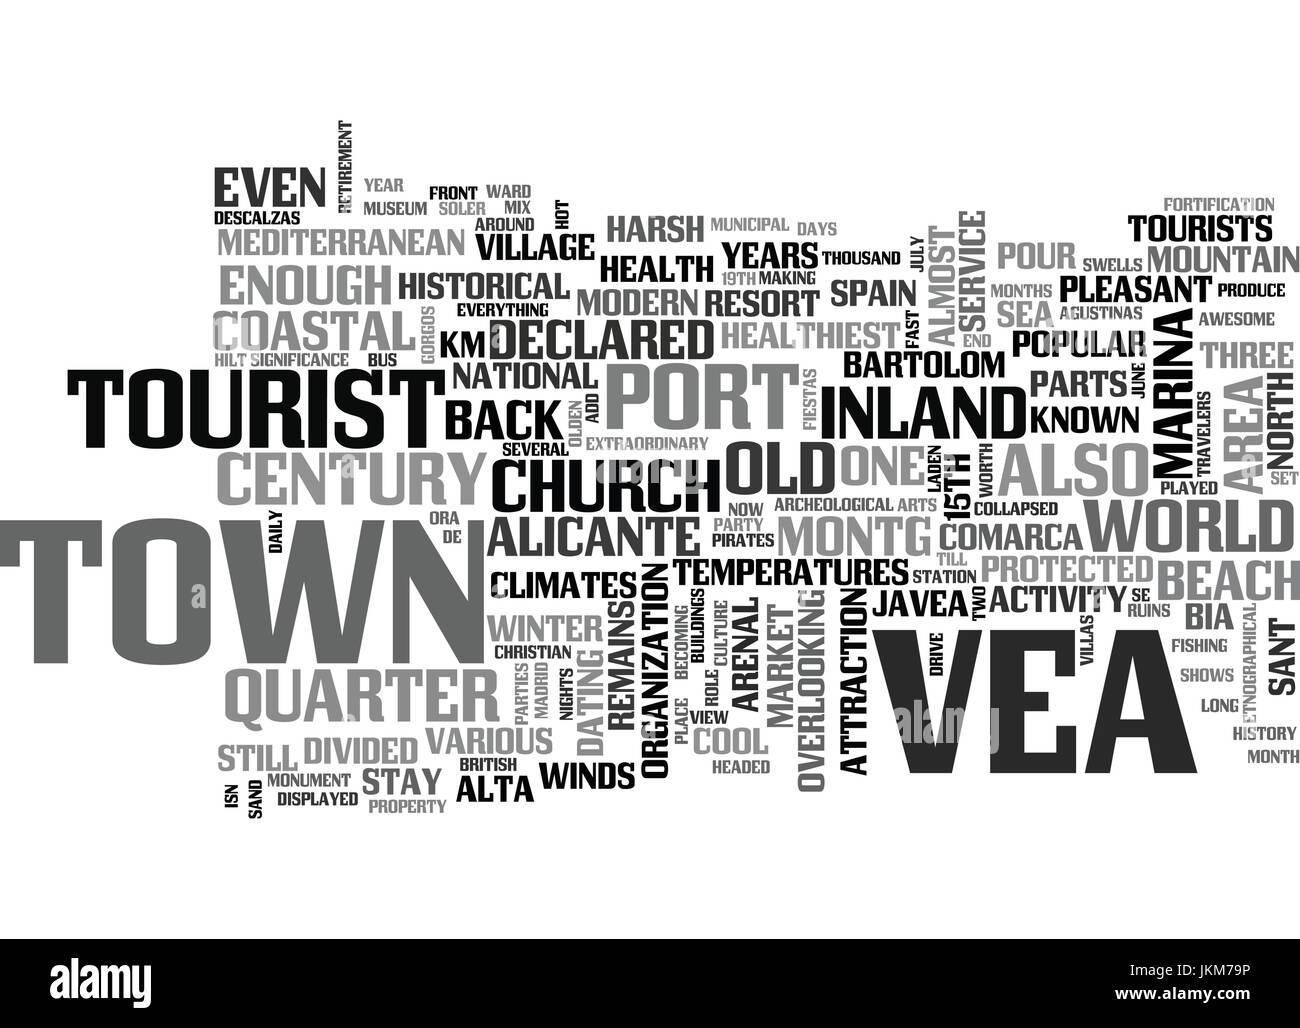 JAVEA A COASTAL PARADISE Text Background Word Cloud Concept - Stock Vector